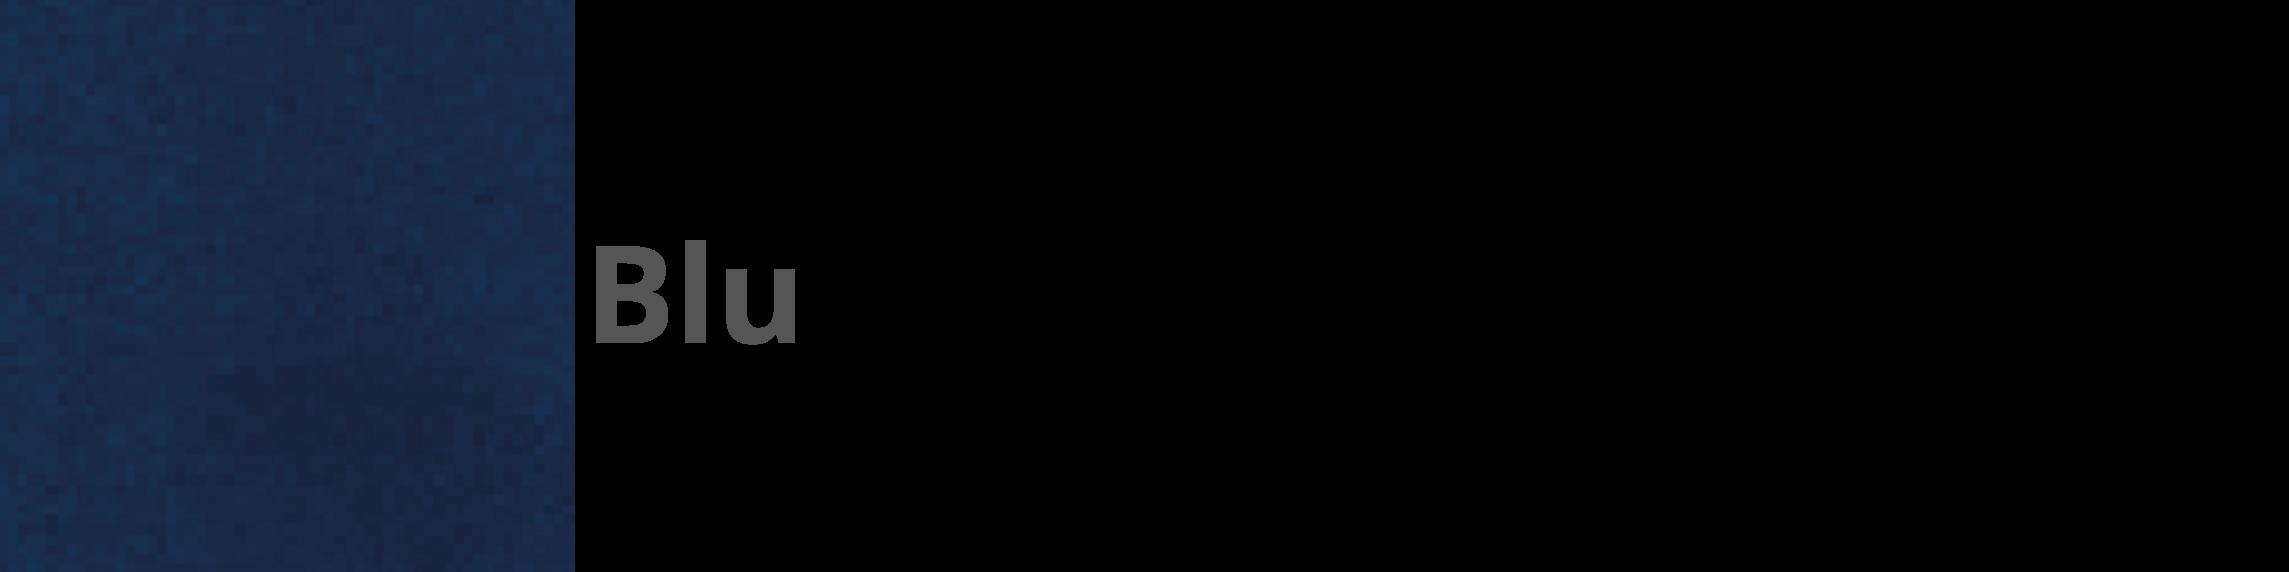 6N30 Microfibra Blu